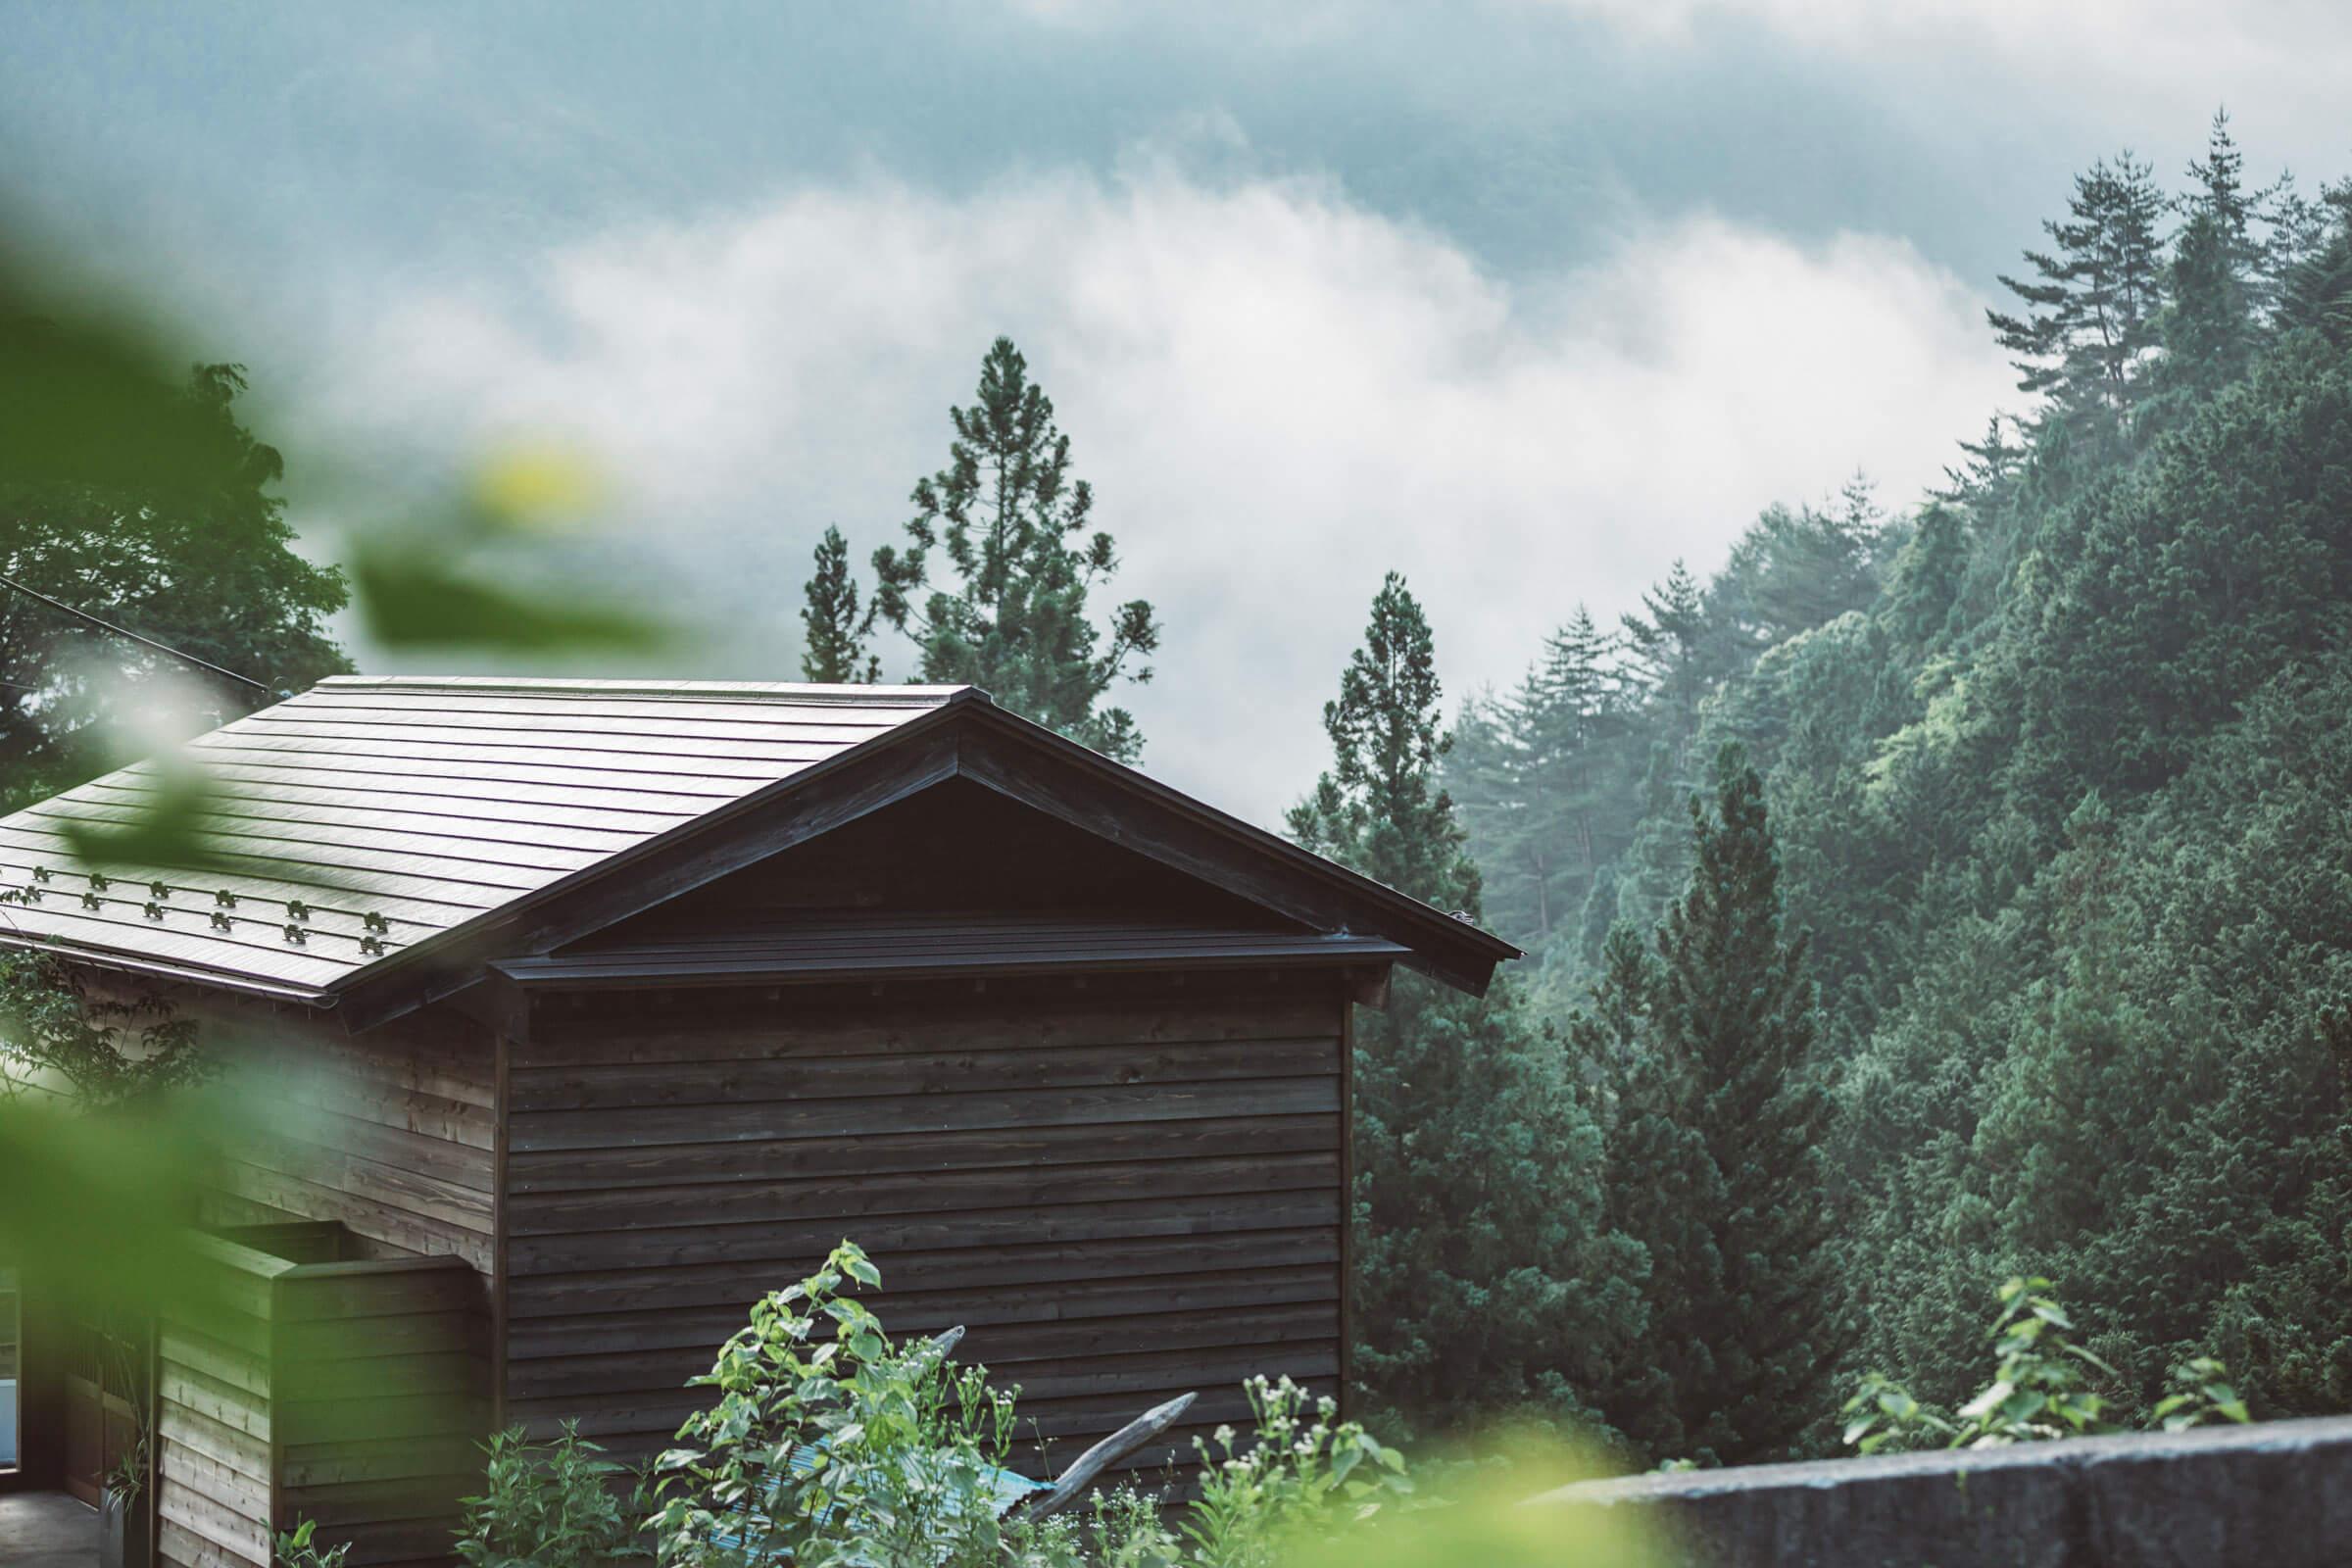 NIPPONIA 小菅 源流の村 崖の家